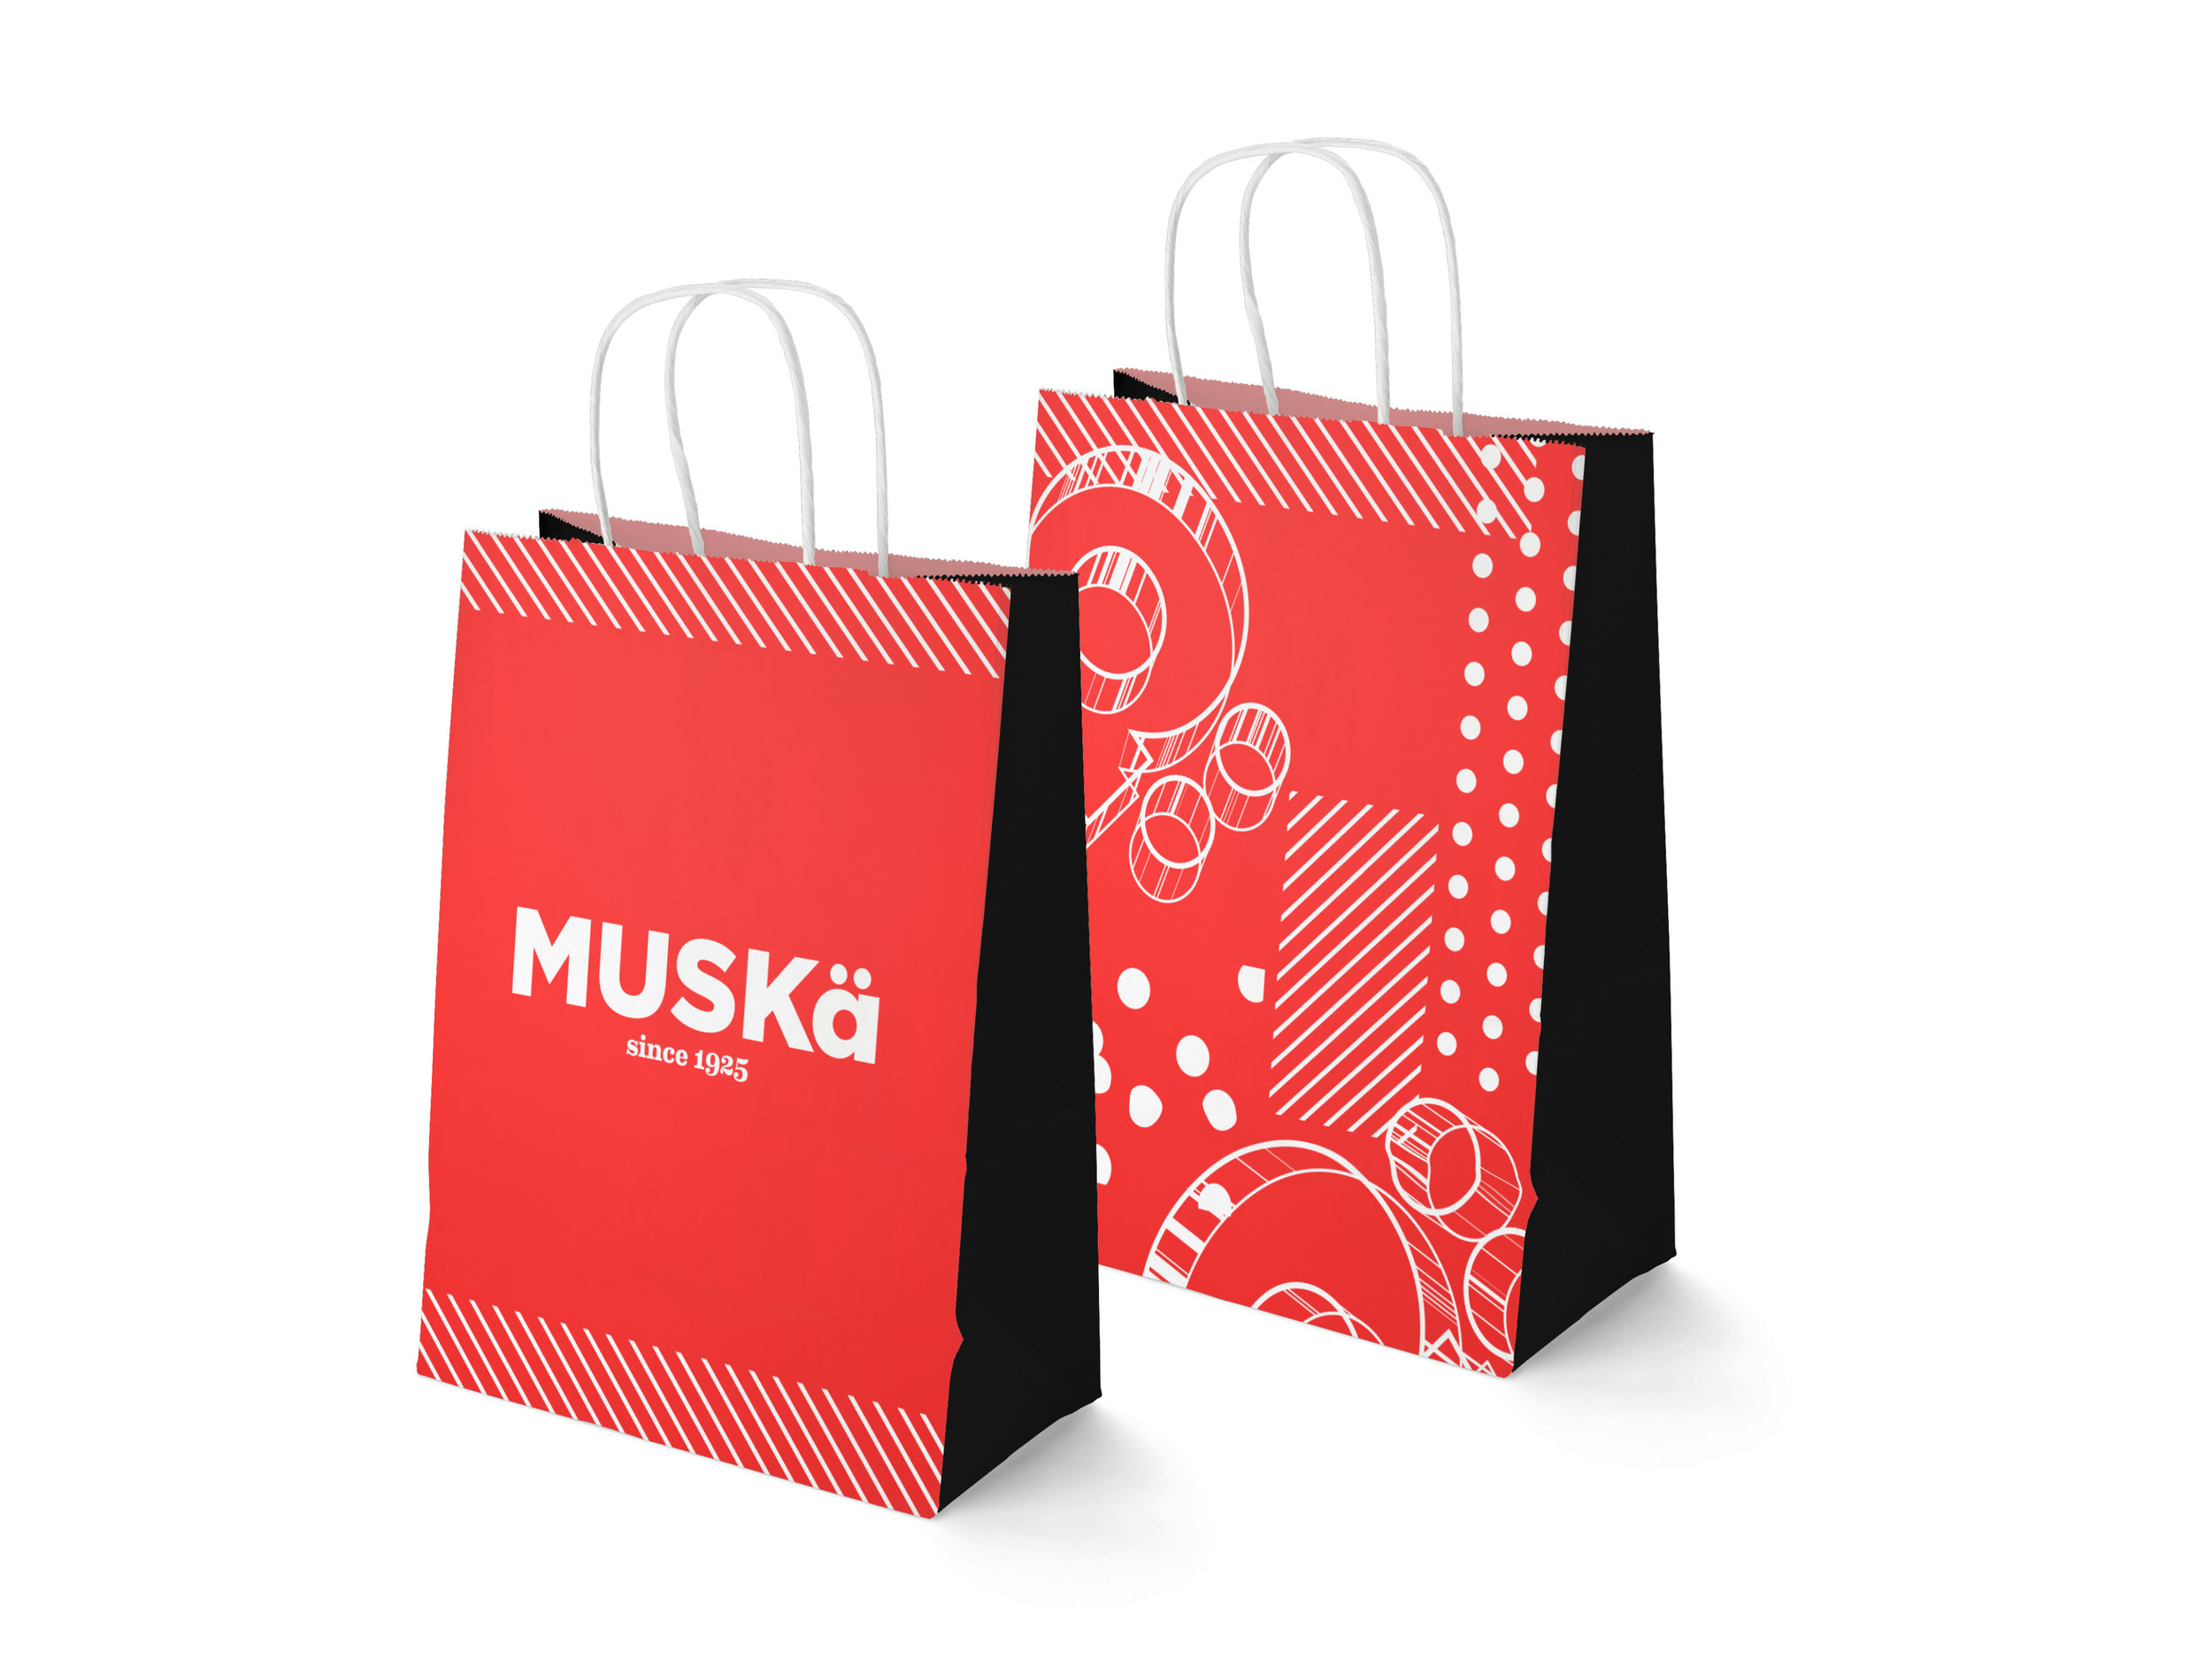 muska_portfolio_20198.jpg